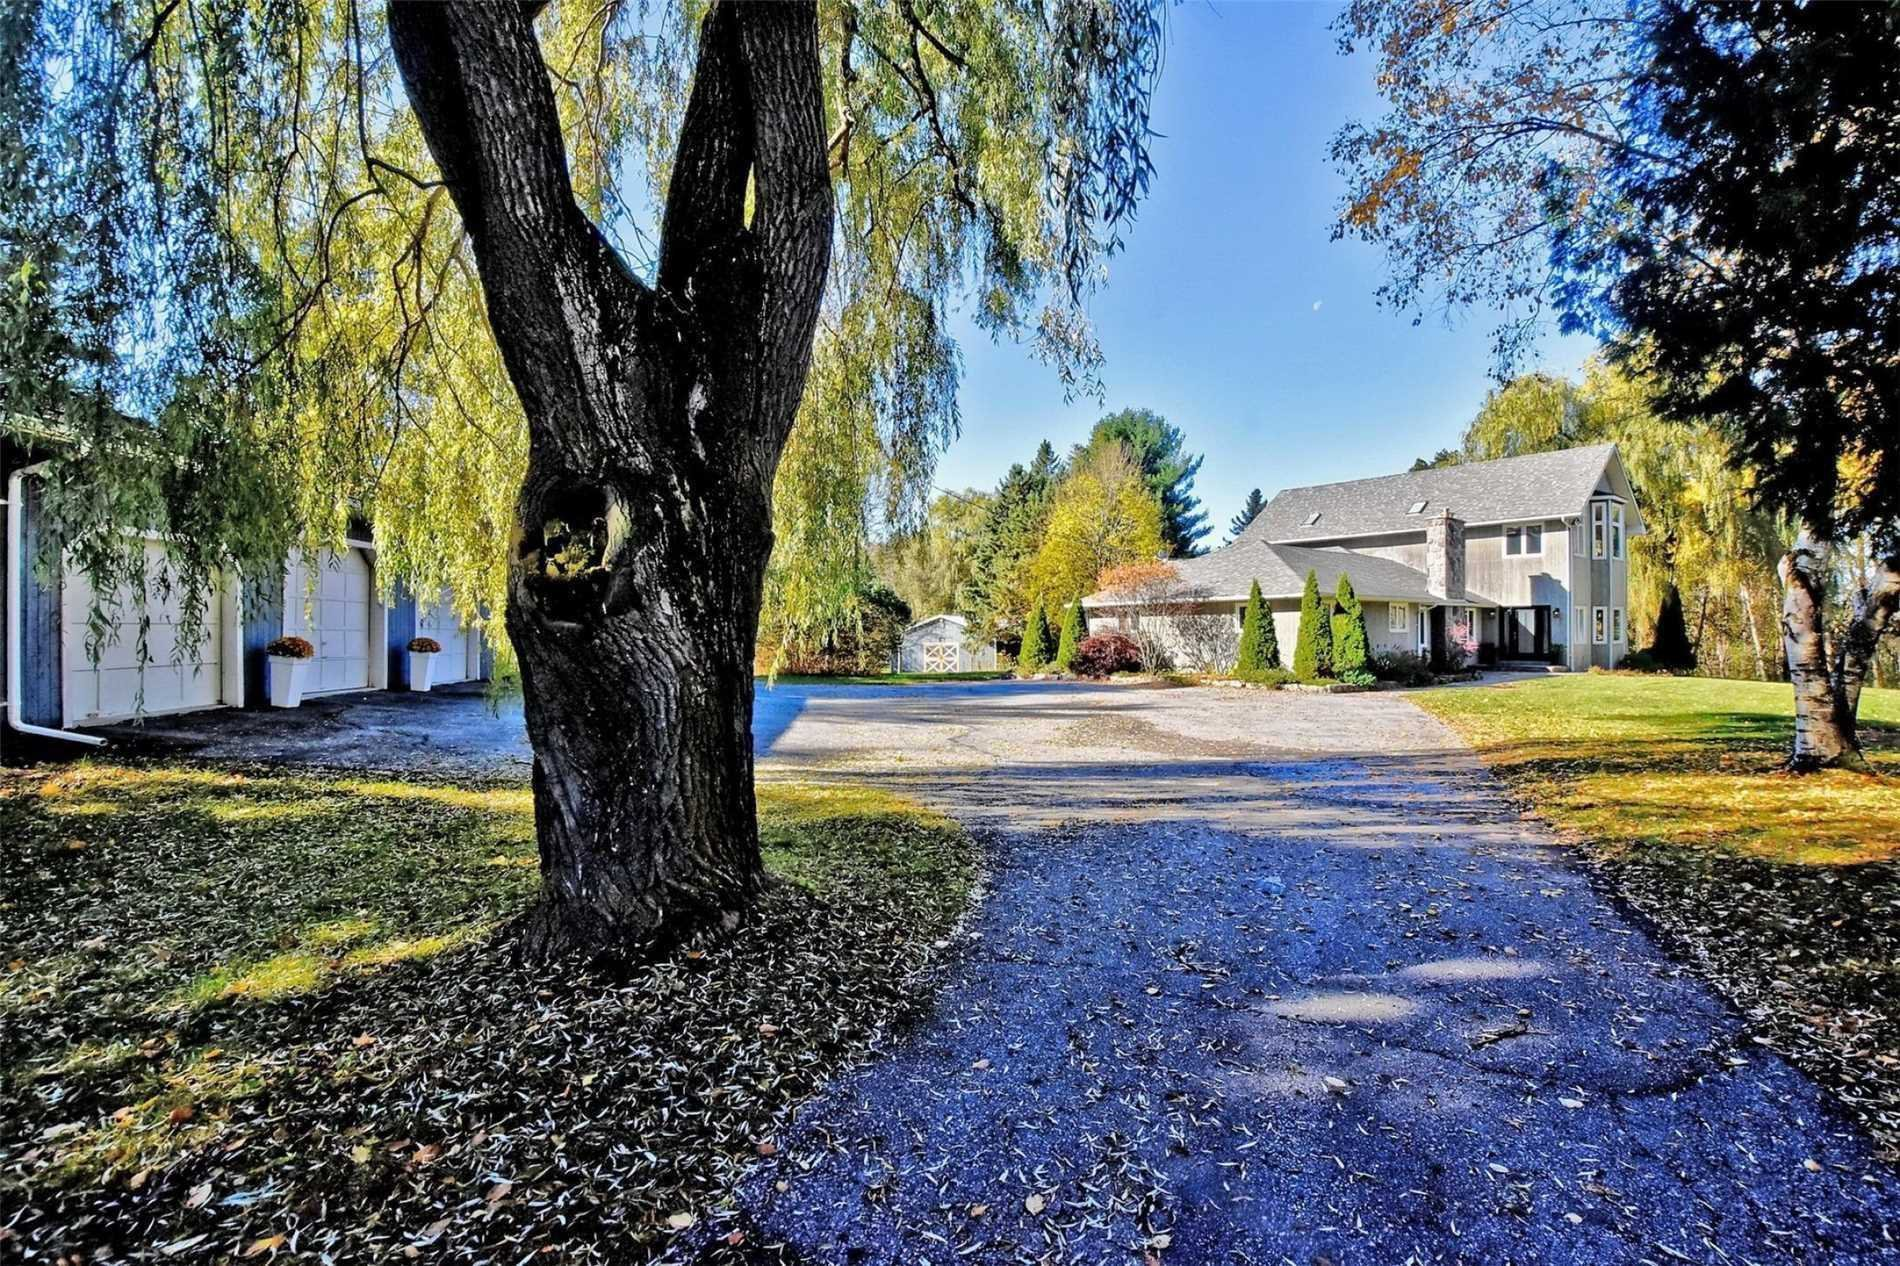 Main Photo: 16932 Mccowan Road in Whitchurch-Stouffville: Rural Whitchurch-Stouffville House (Bungaloft) for sale : MLS®# N4594160